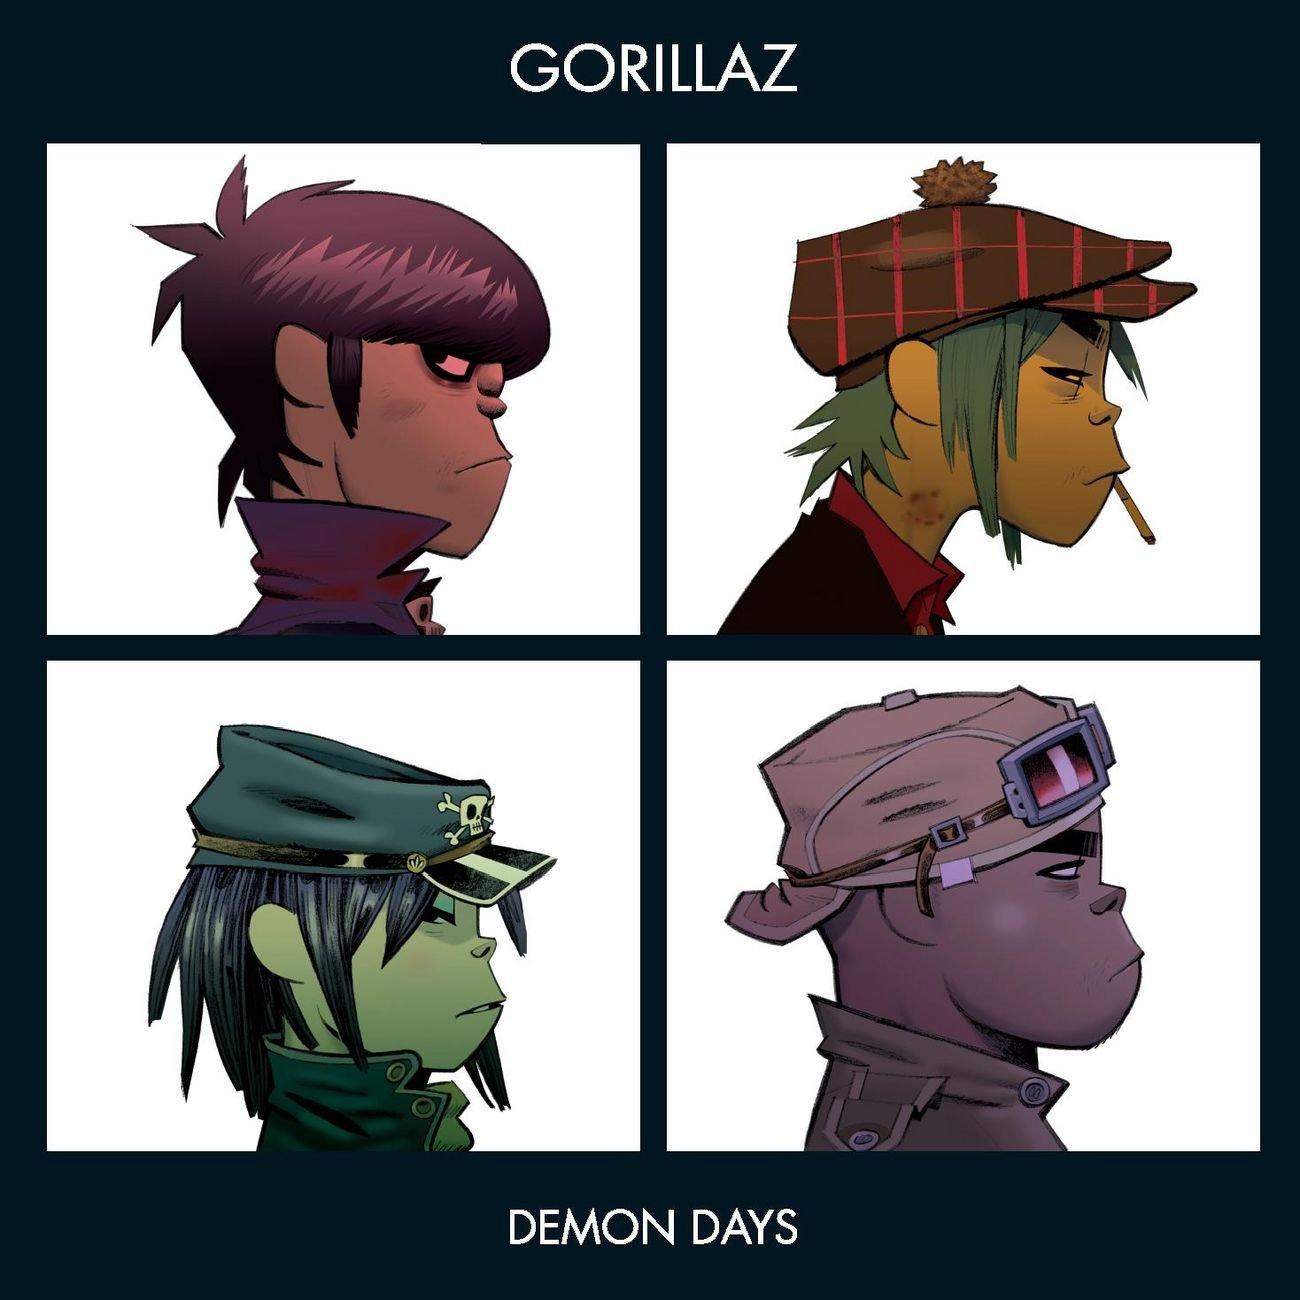 Y Gorillaz Demon Days